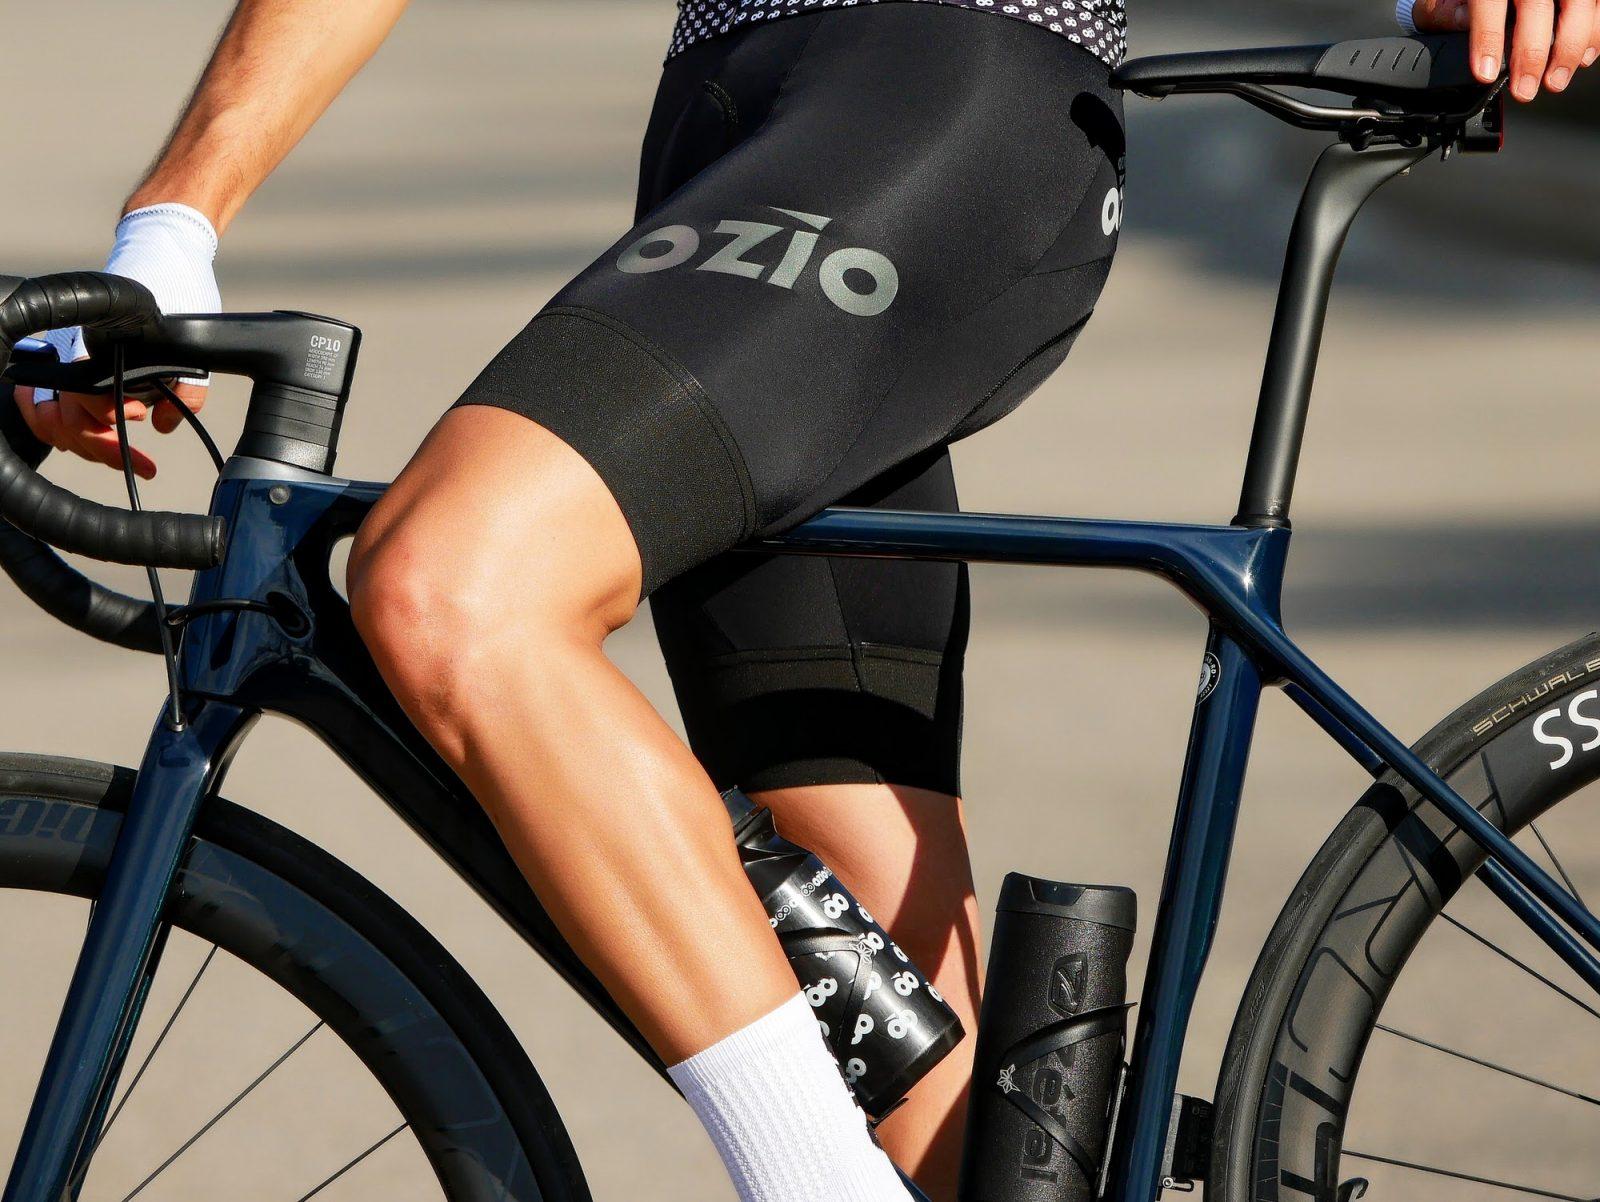 Cuissard de vélo noir OZIO